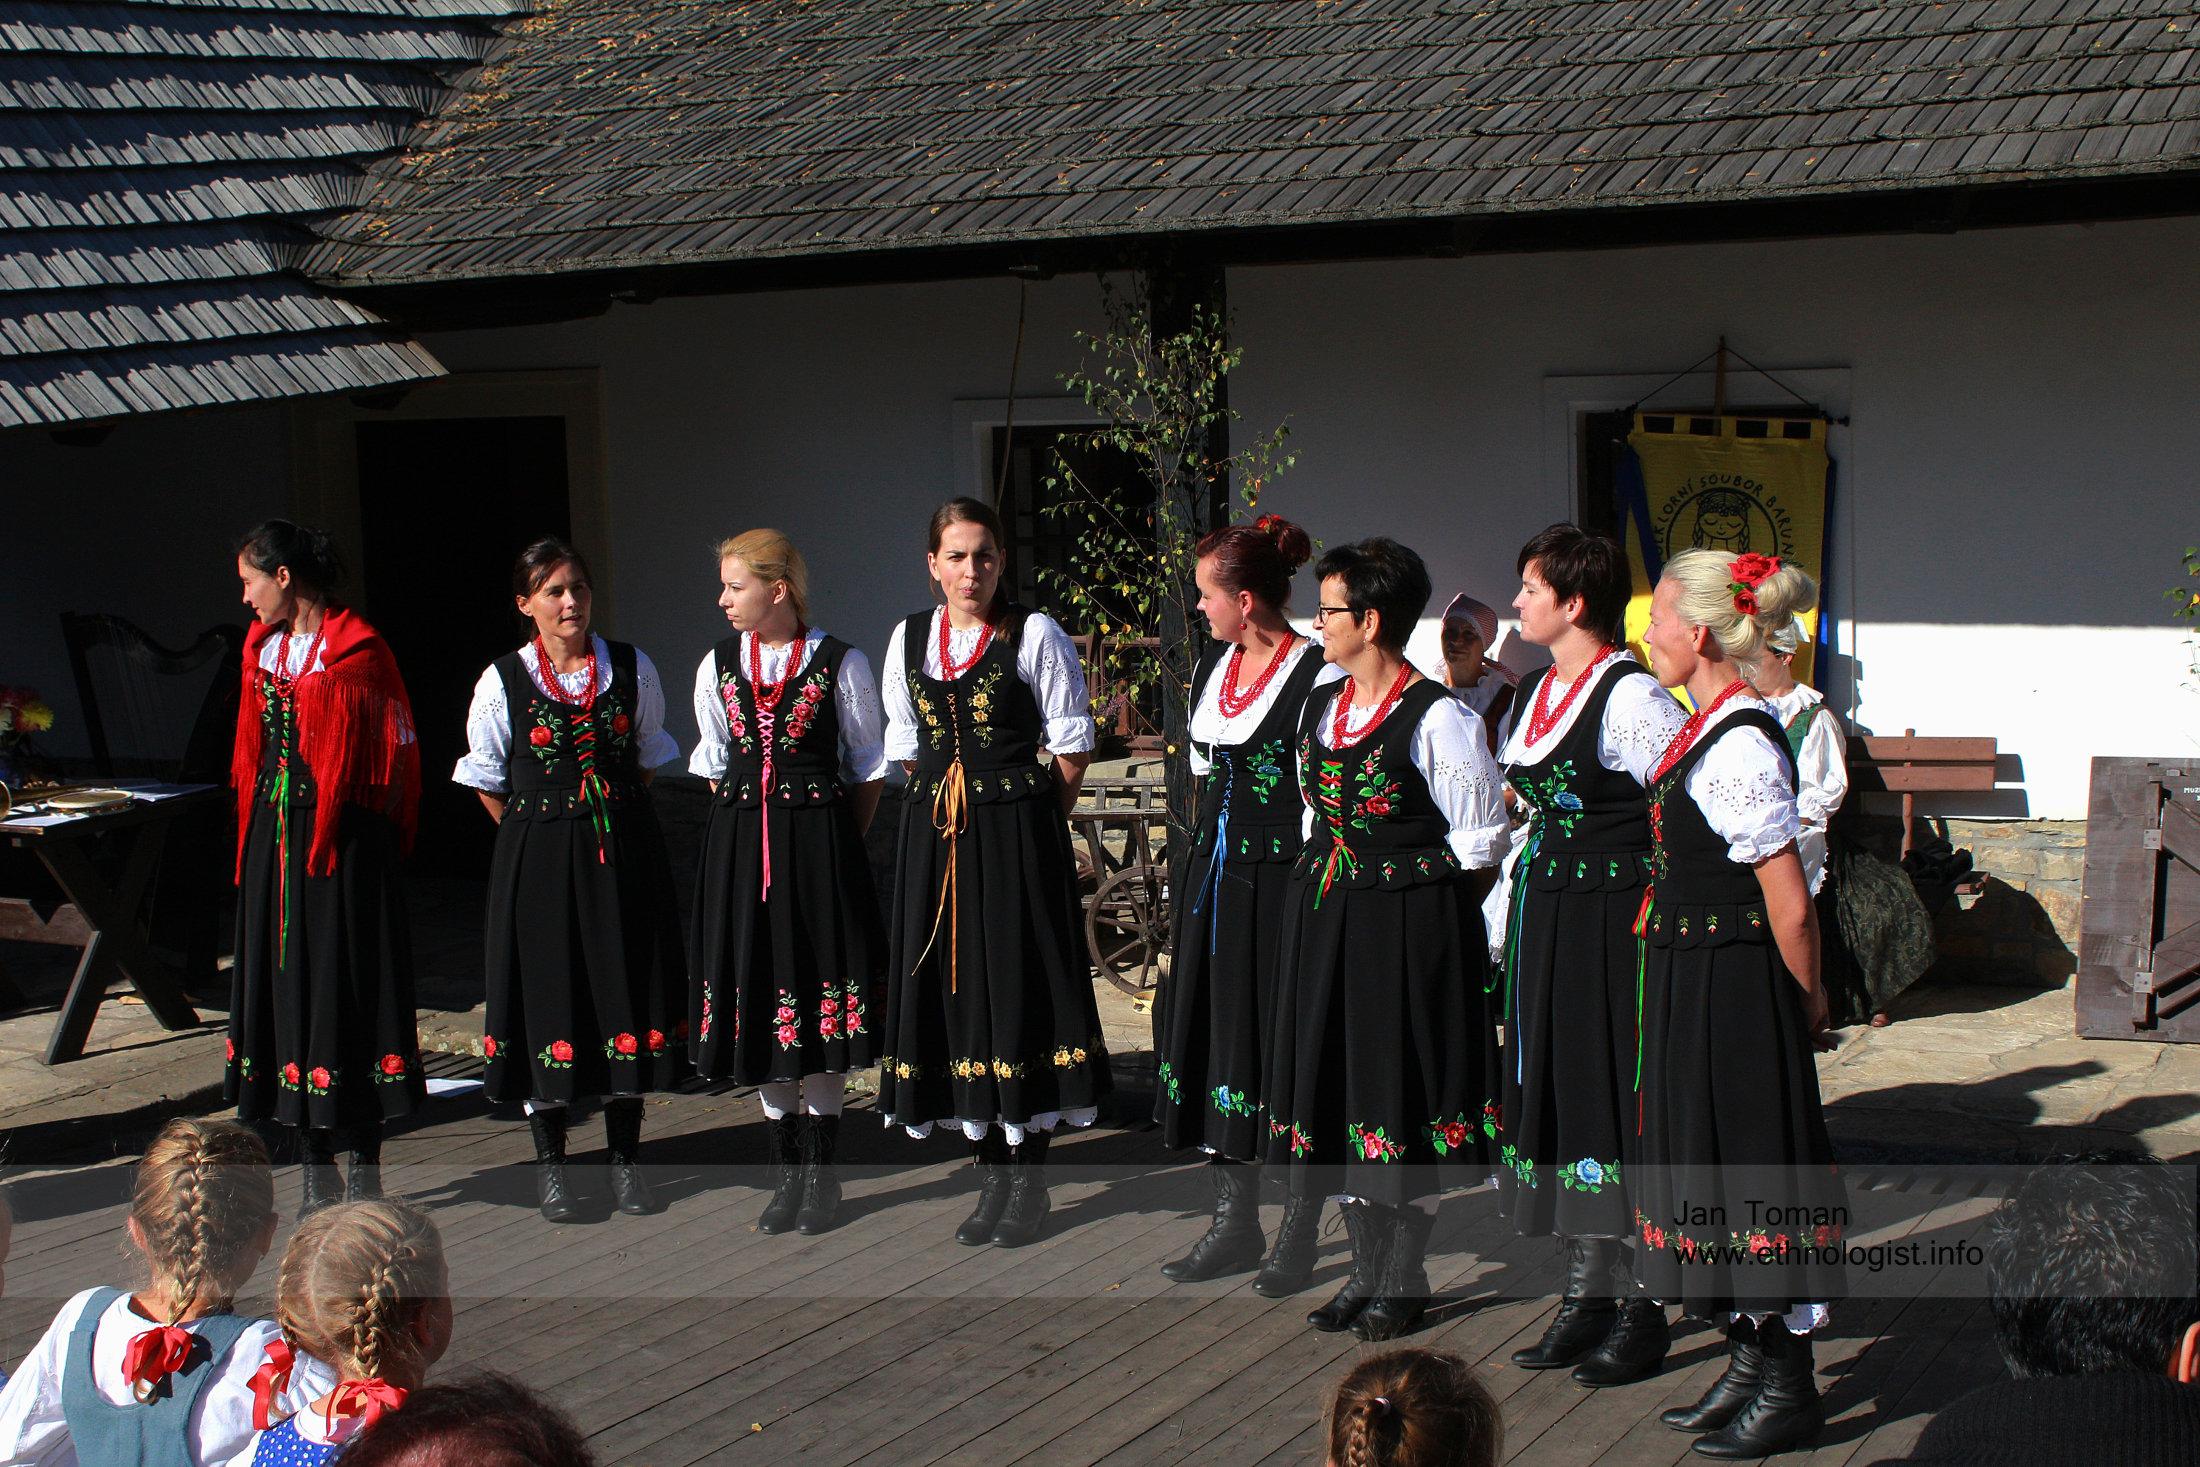 The Poland folklore band in Czech town Ceska Skalice